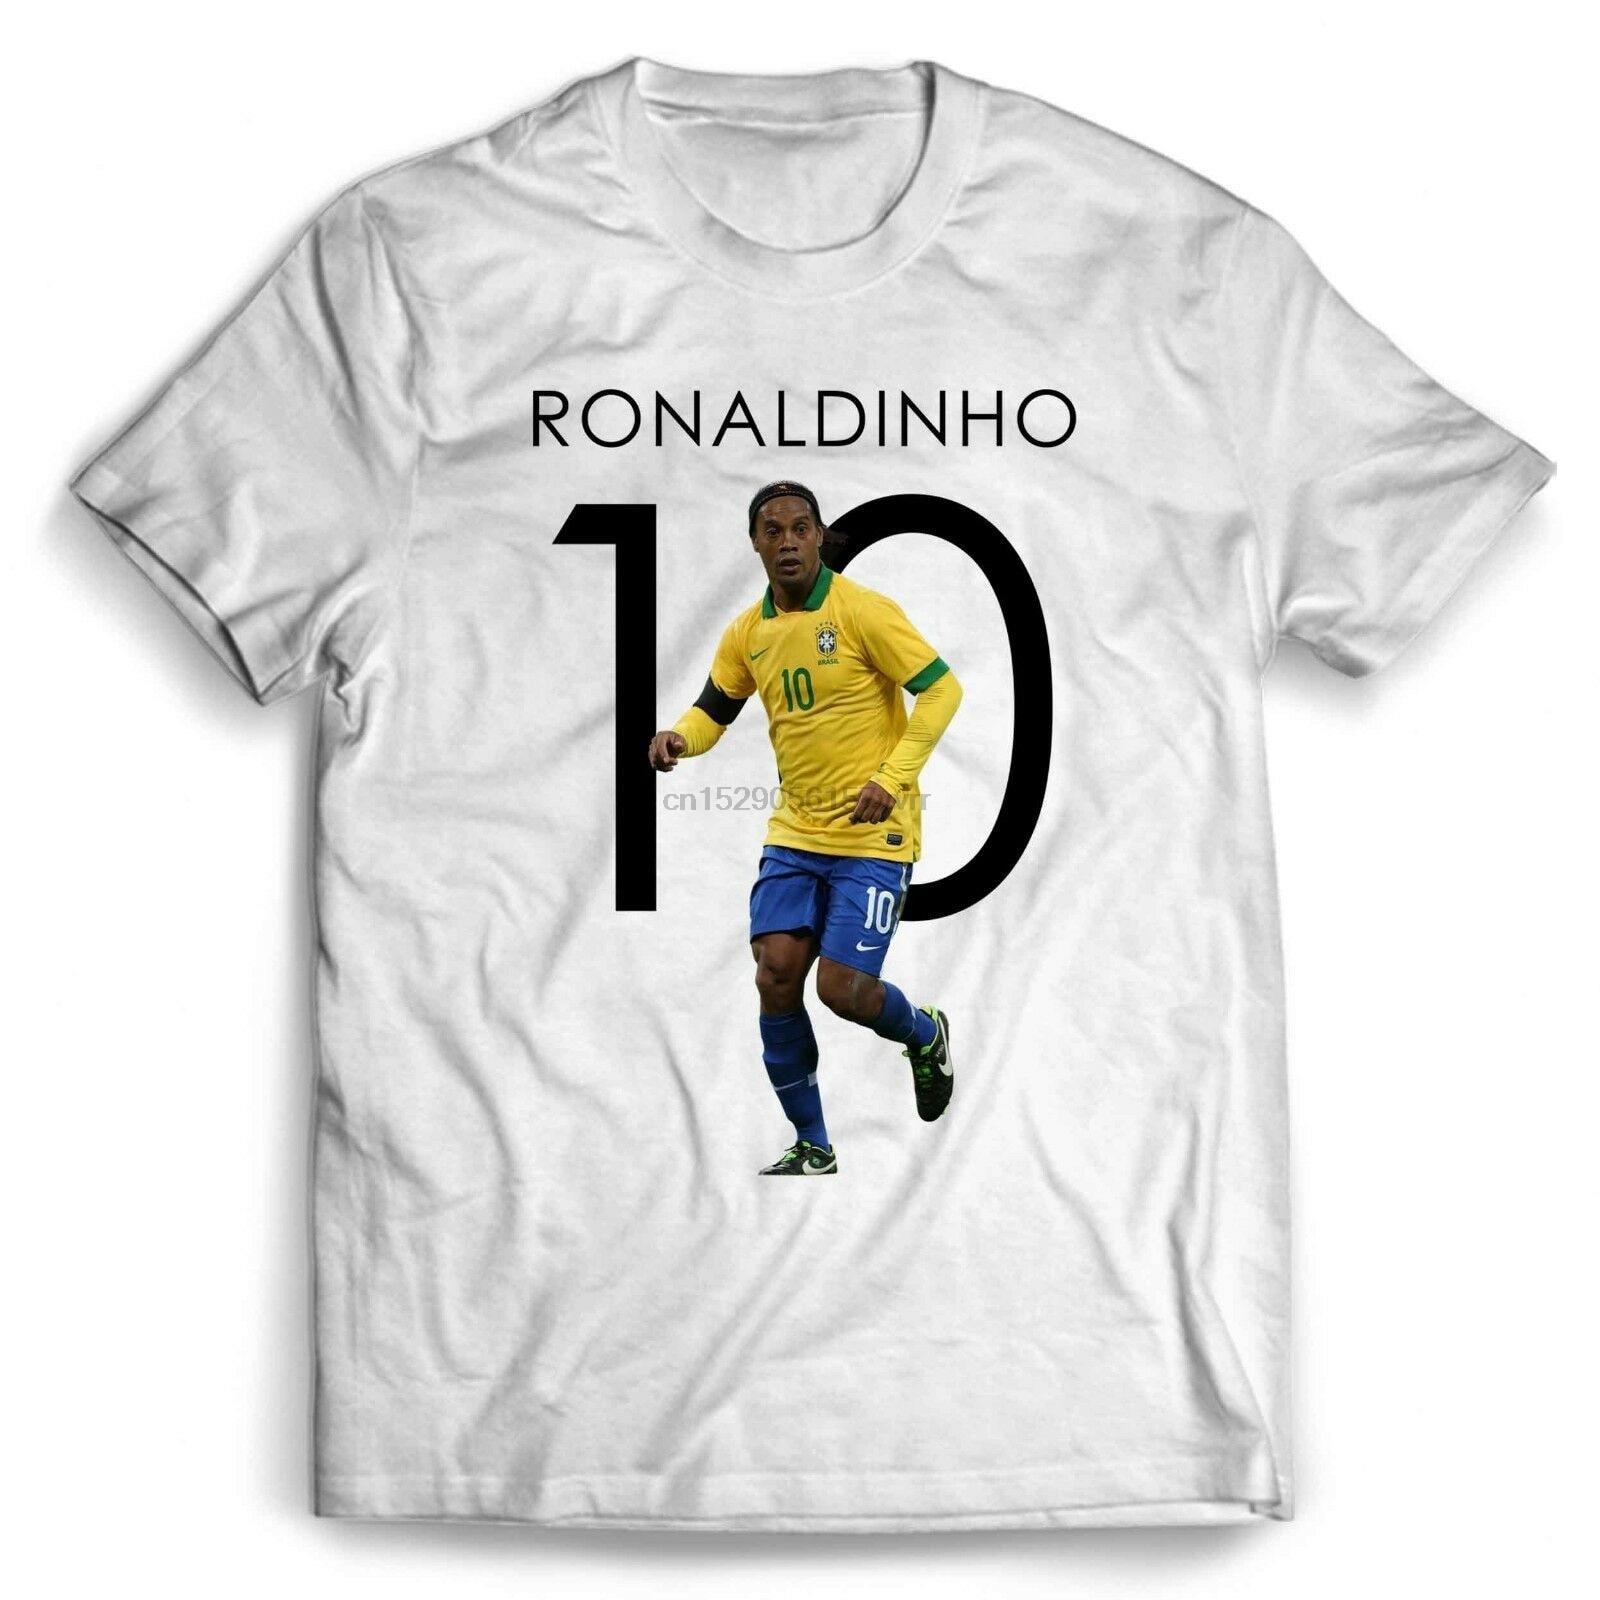 Ronaldinho 10 Brasil hombres mujeres camiseta